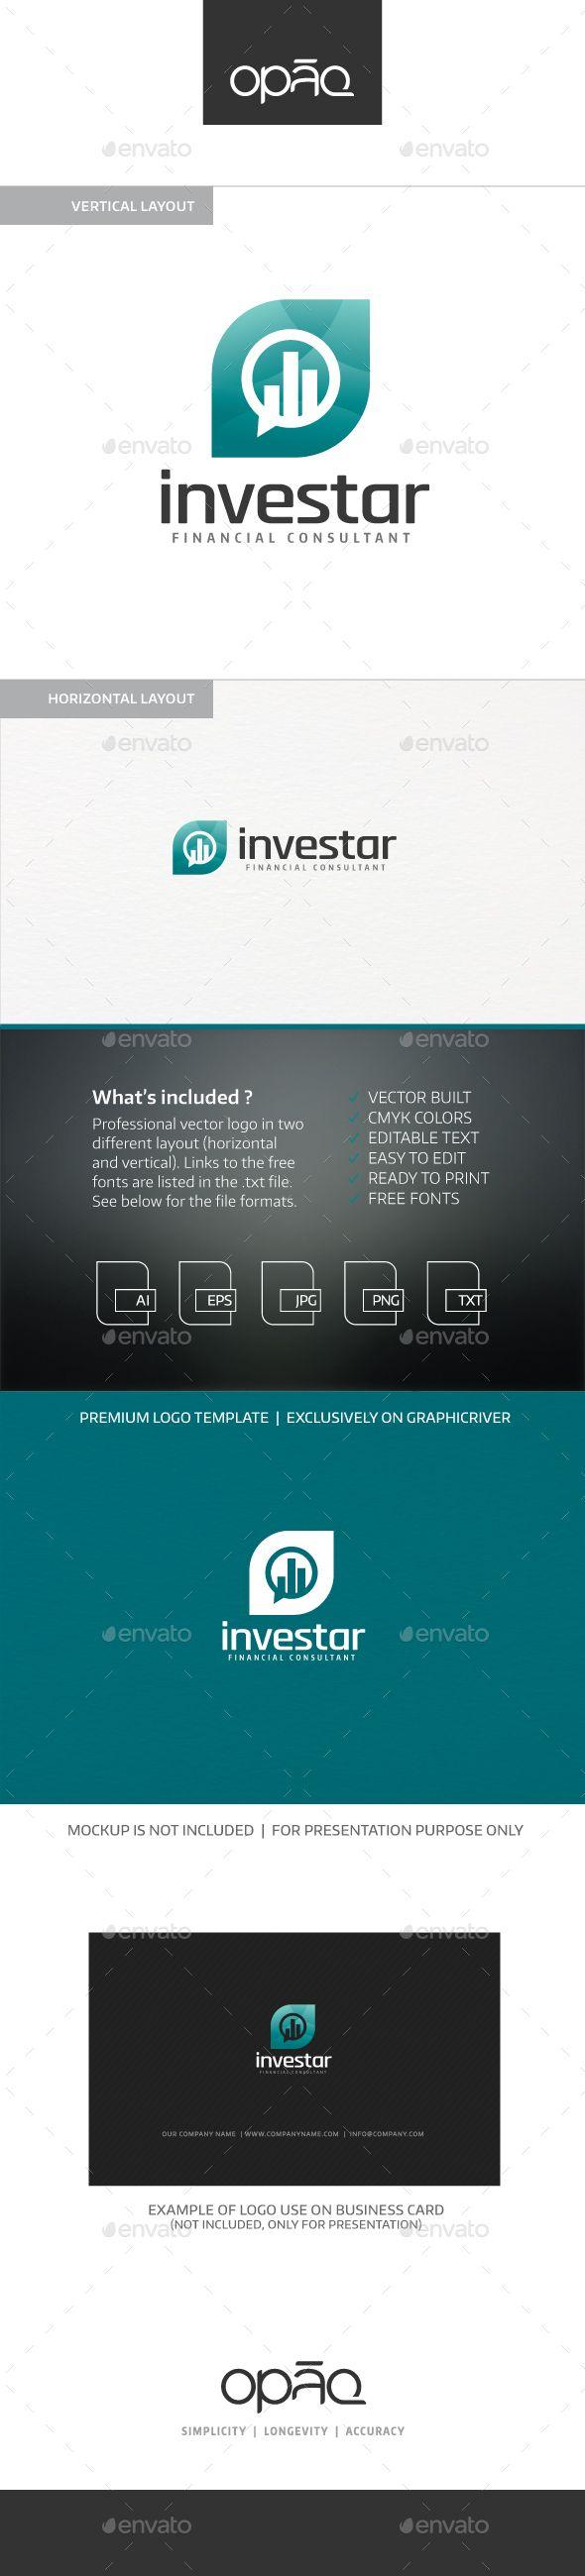 Investar Logo - Symbols Logo Templates Download here : https://graphicriver.net/item/investar-logo/18666892?s_rank=121&ref=Al-fatih